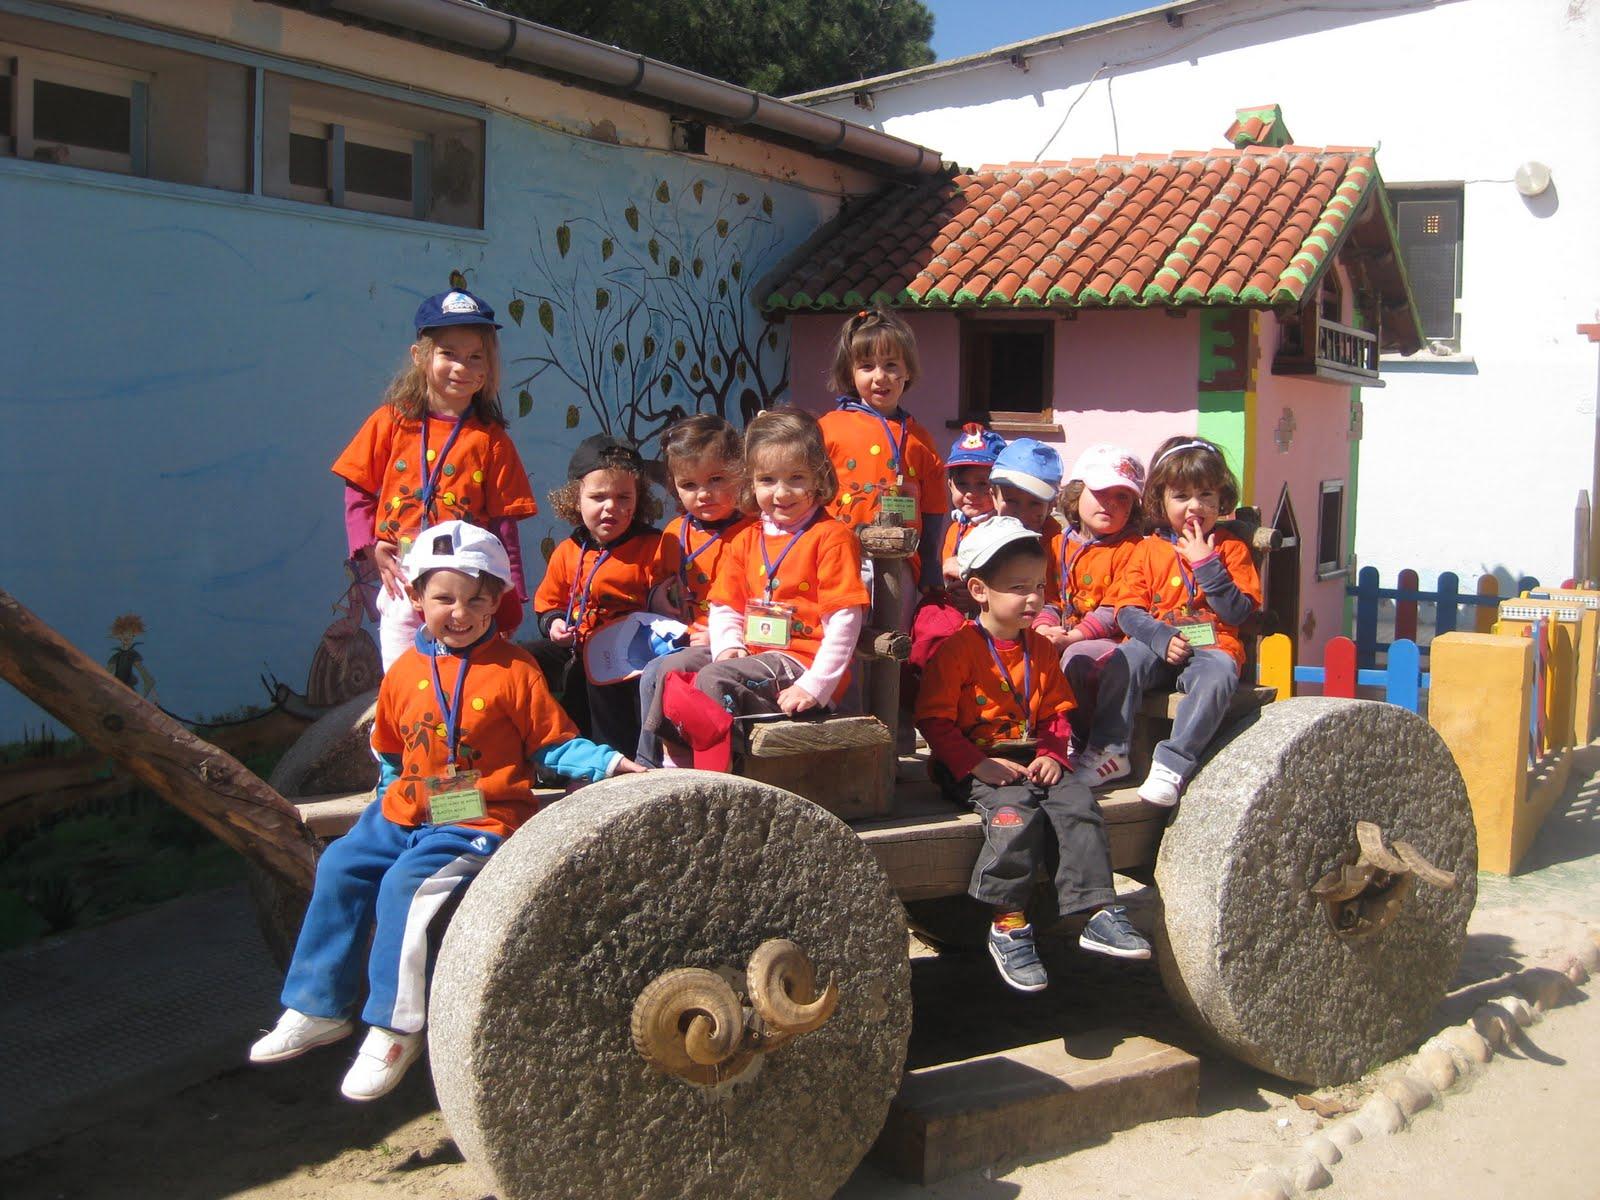 granja escuela juliana: